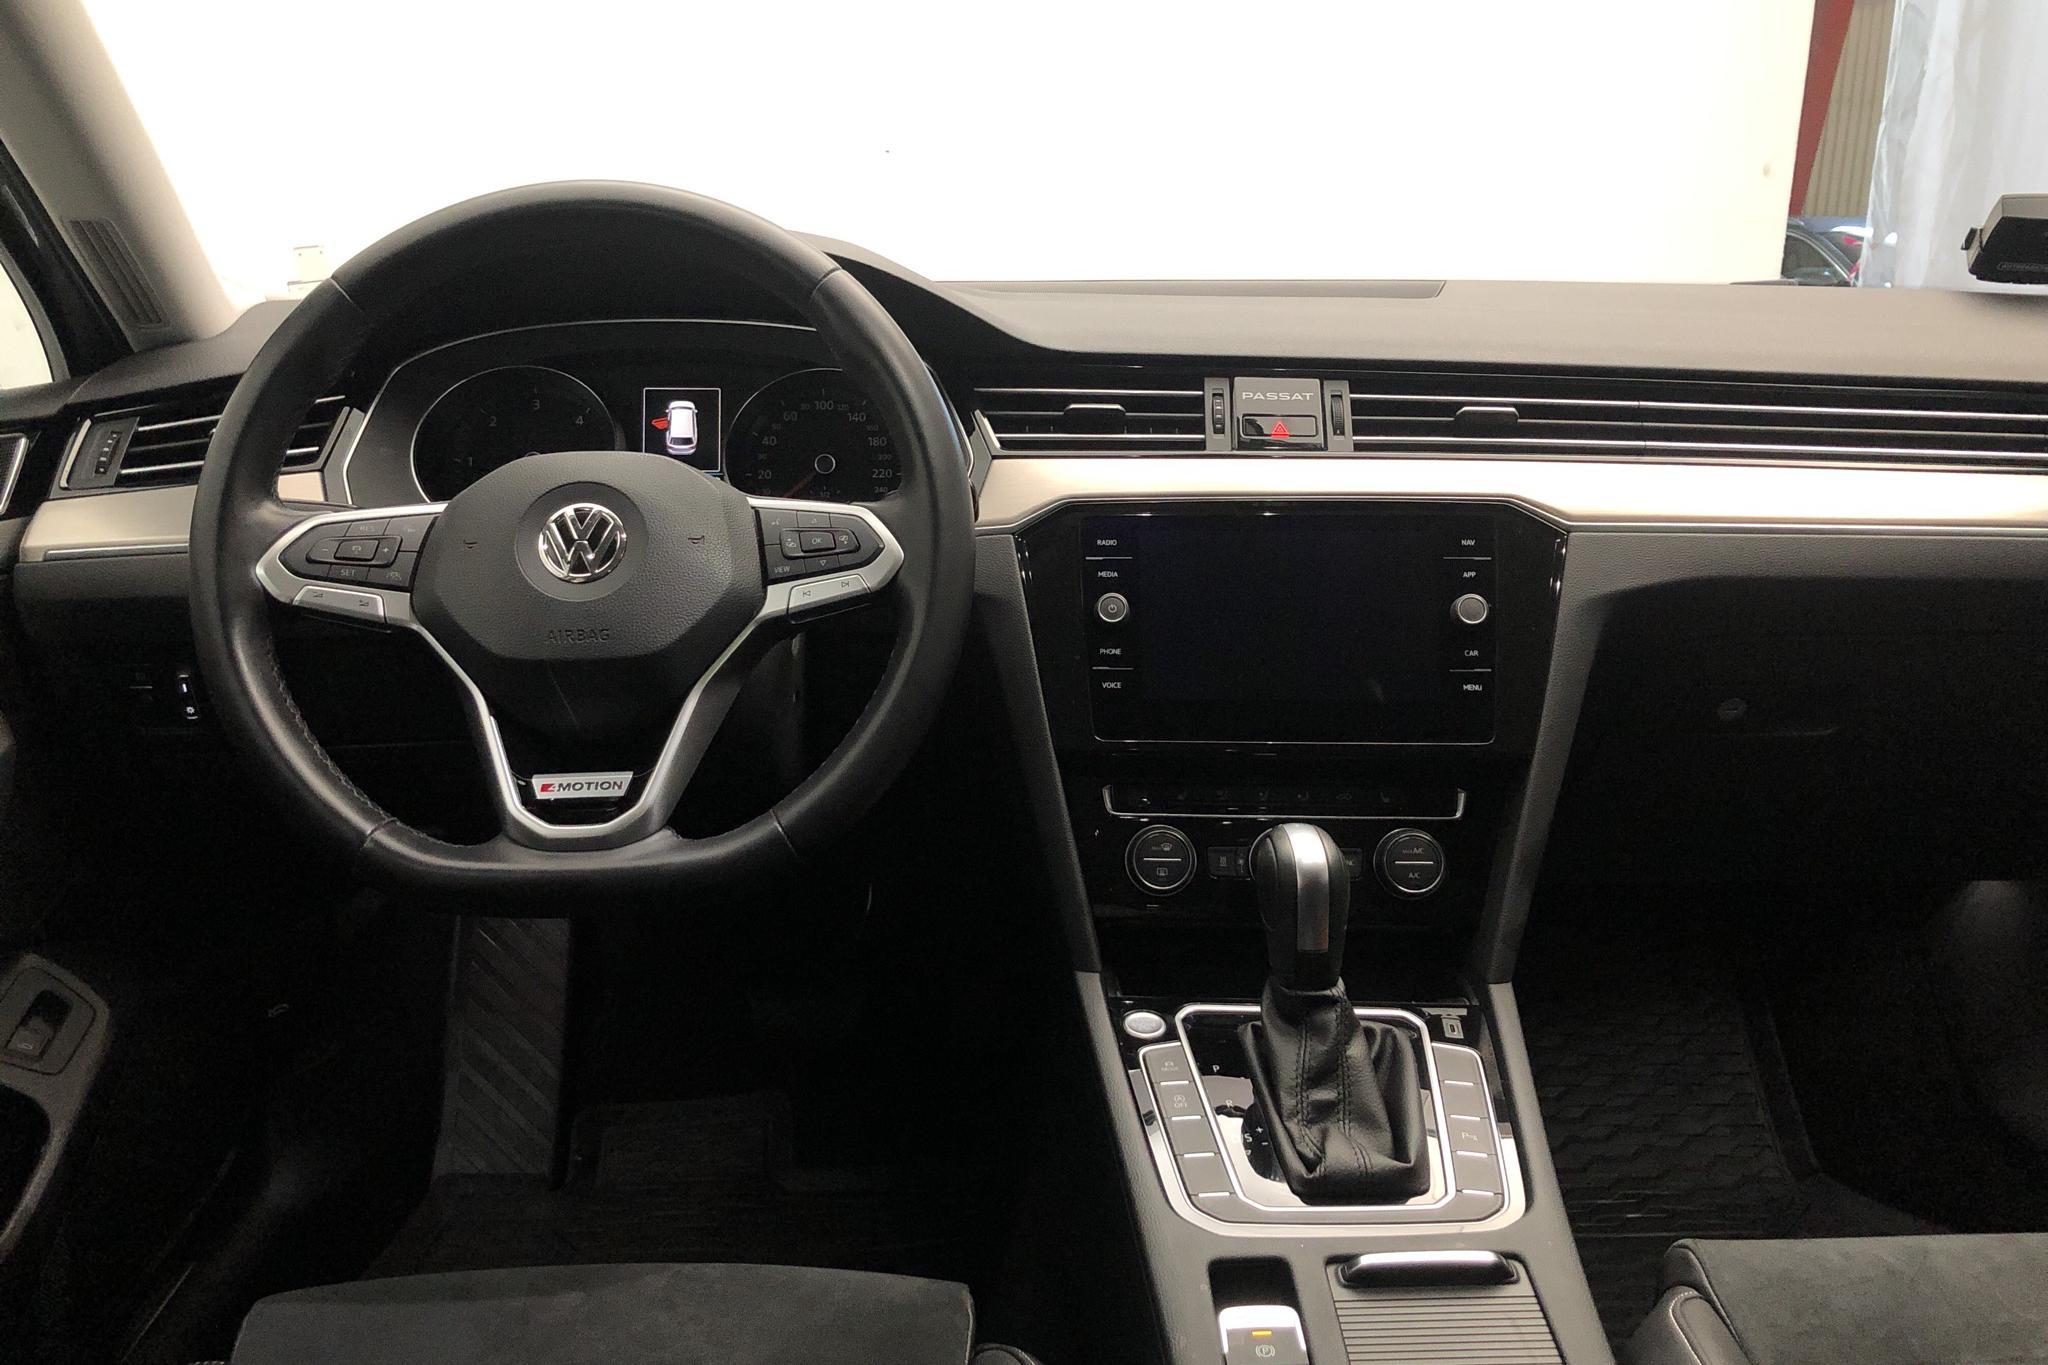 VW Passat 2.0 TDI Sportscombi 4MOTION (190hk) - 2 203 mil - Automat - silver - 2020